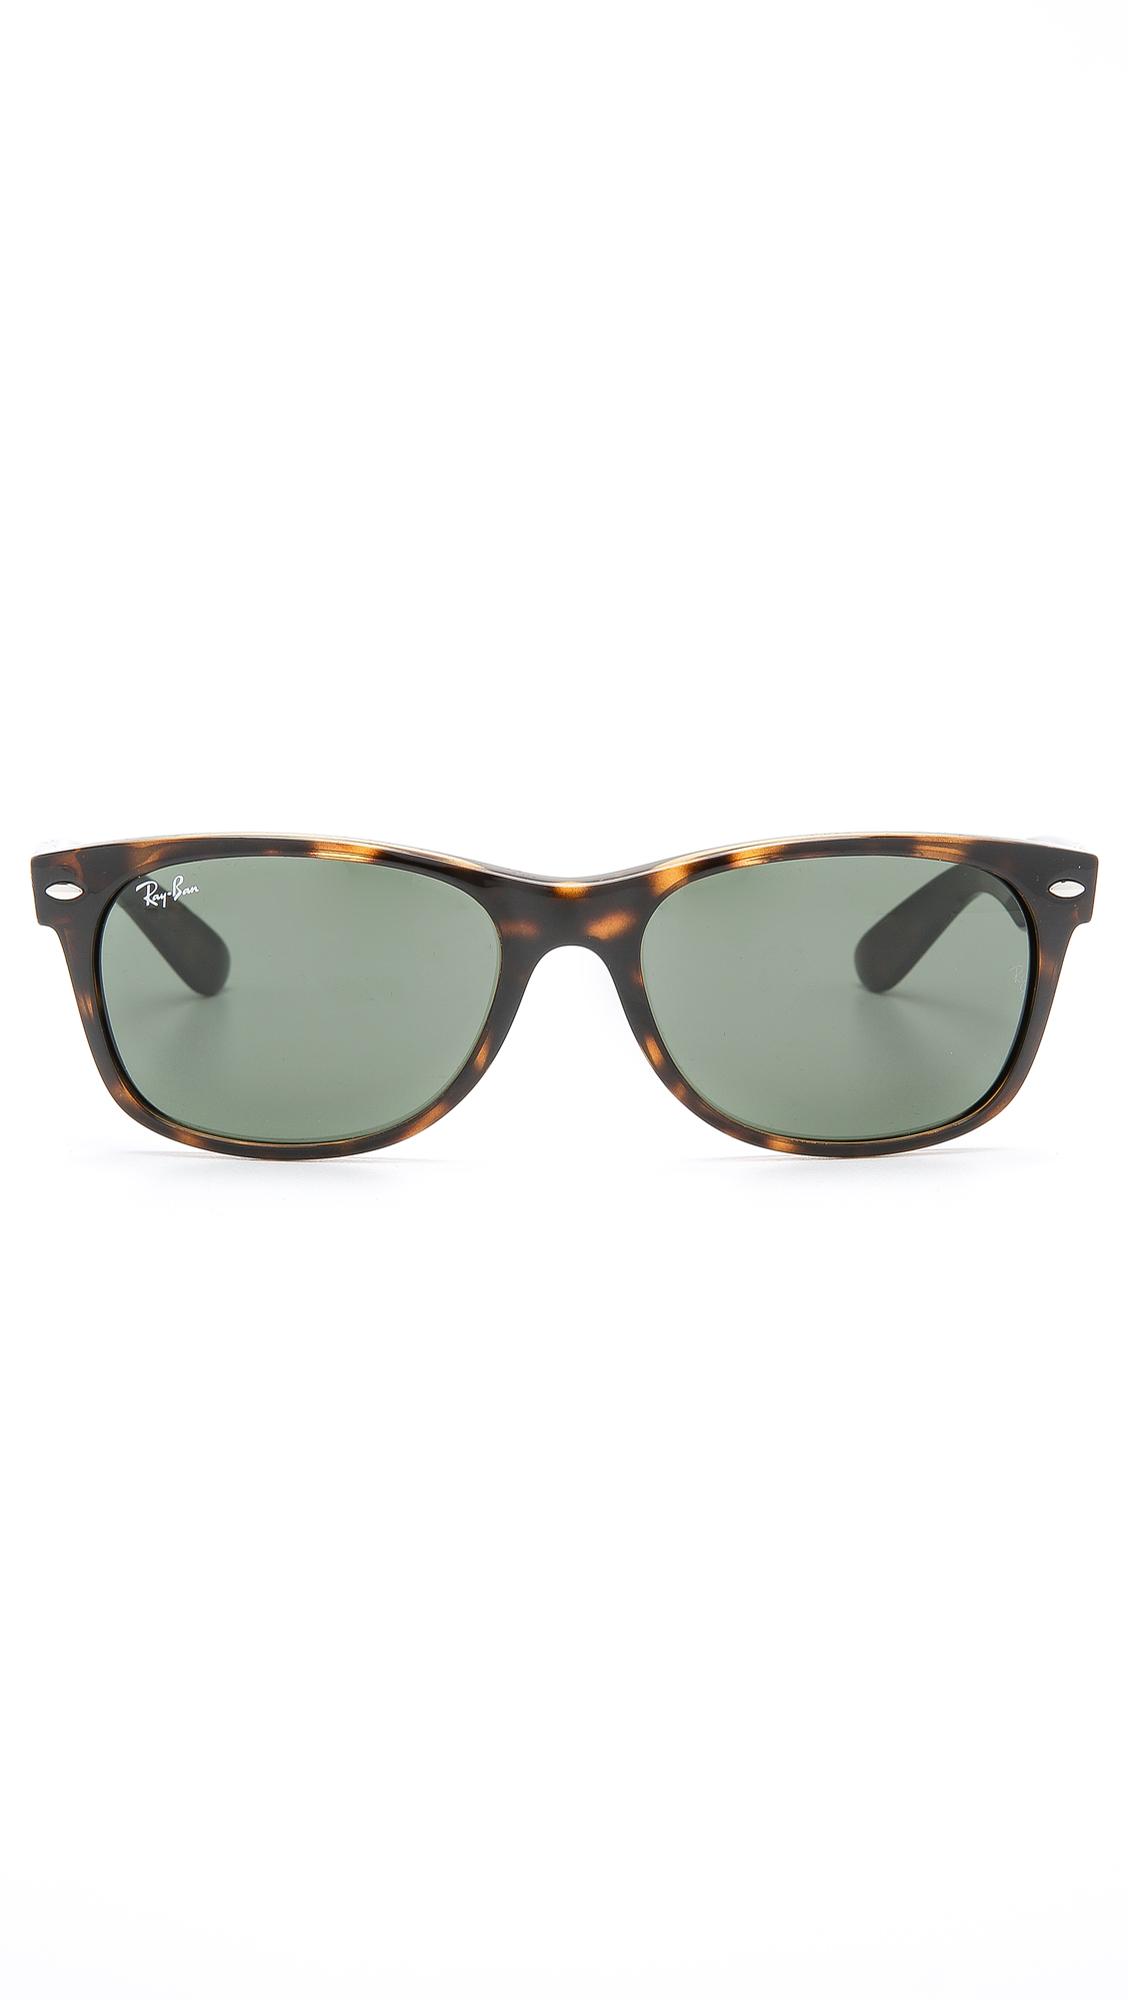 Ray Ban Glasses Frames Green : Ray-ban New Wayfarer Sunglasses in Green for Men Lyst